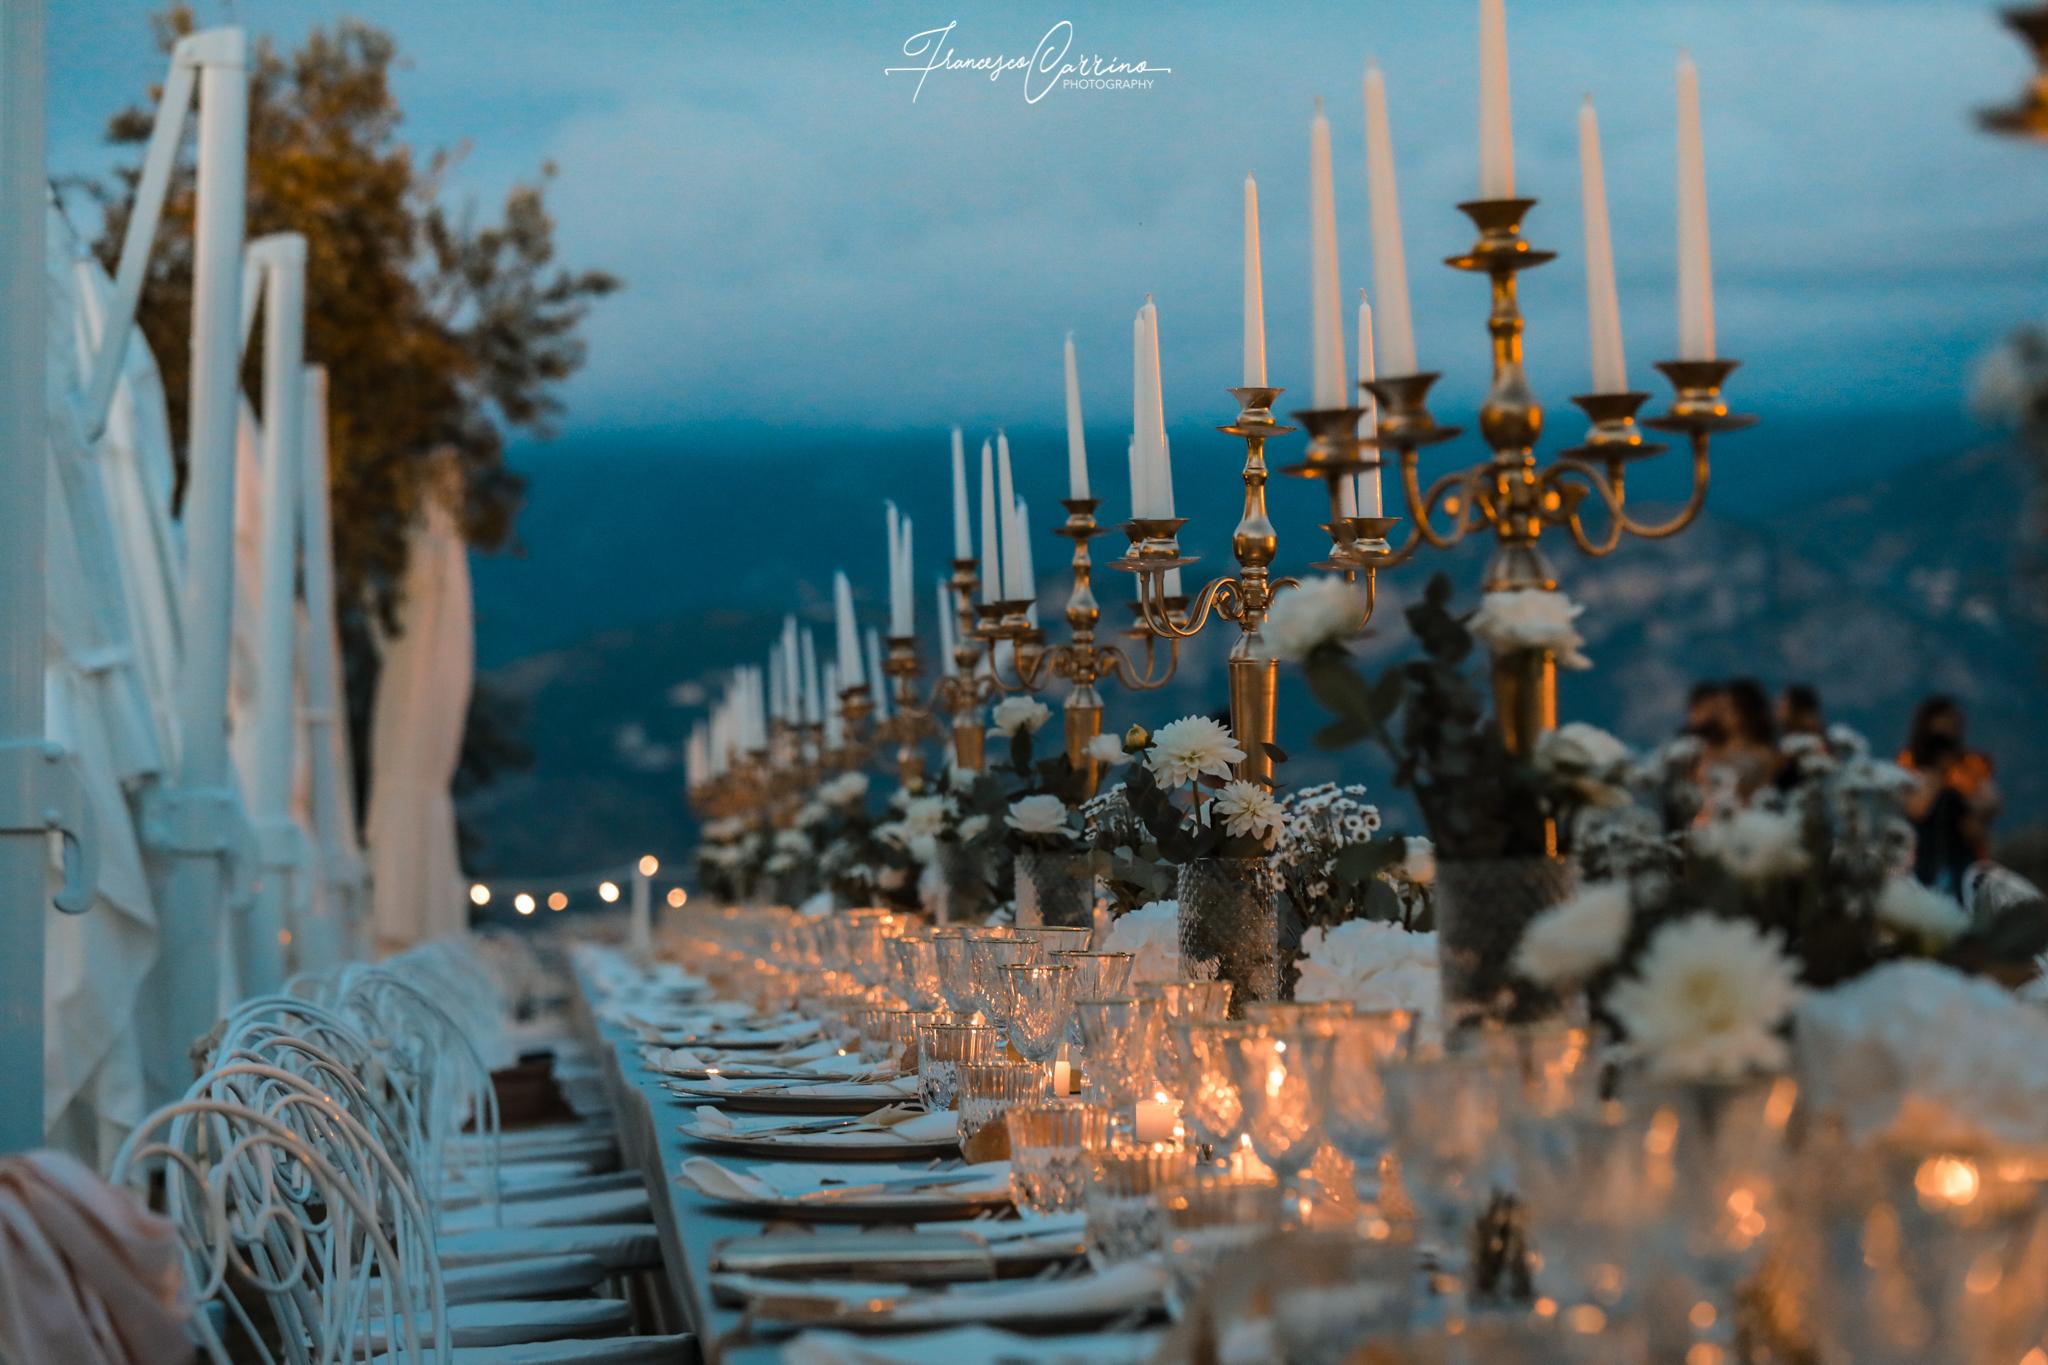 http://www.weddingamalfi.com/wp-content/uploads/Giannenza-13-luglio-2019-22.jpg